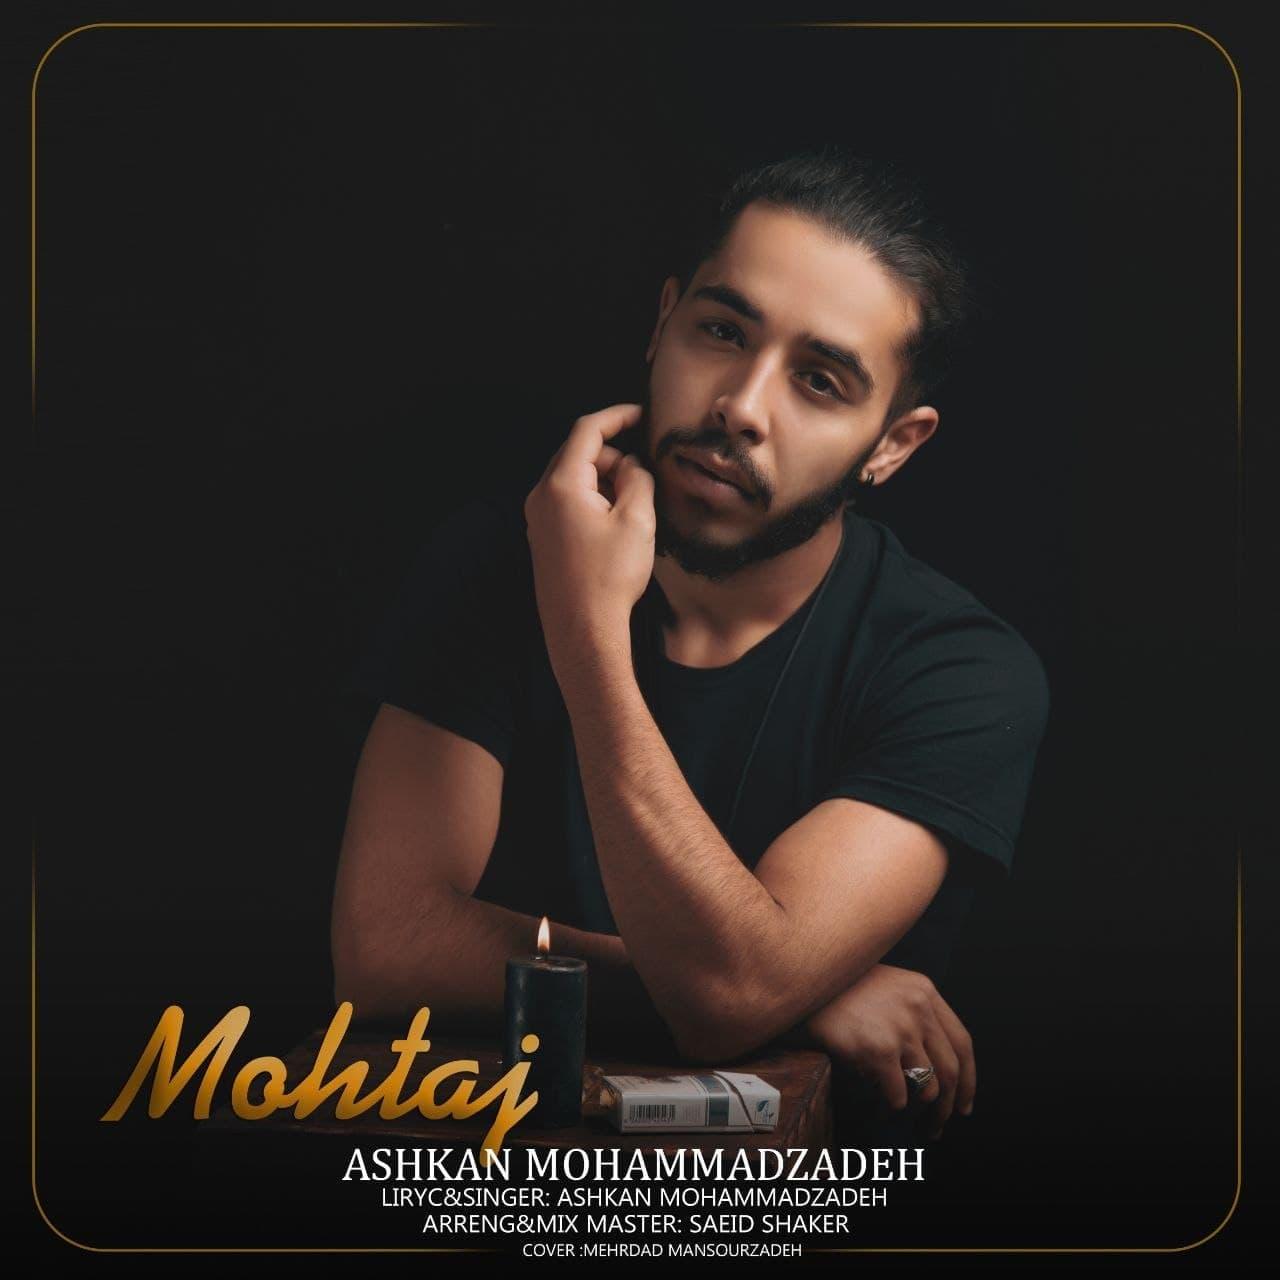 https://s18.picofile.com/file/8433637984/01Ashkan_Mohamadzadeh_Mohtaj.jpg